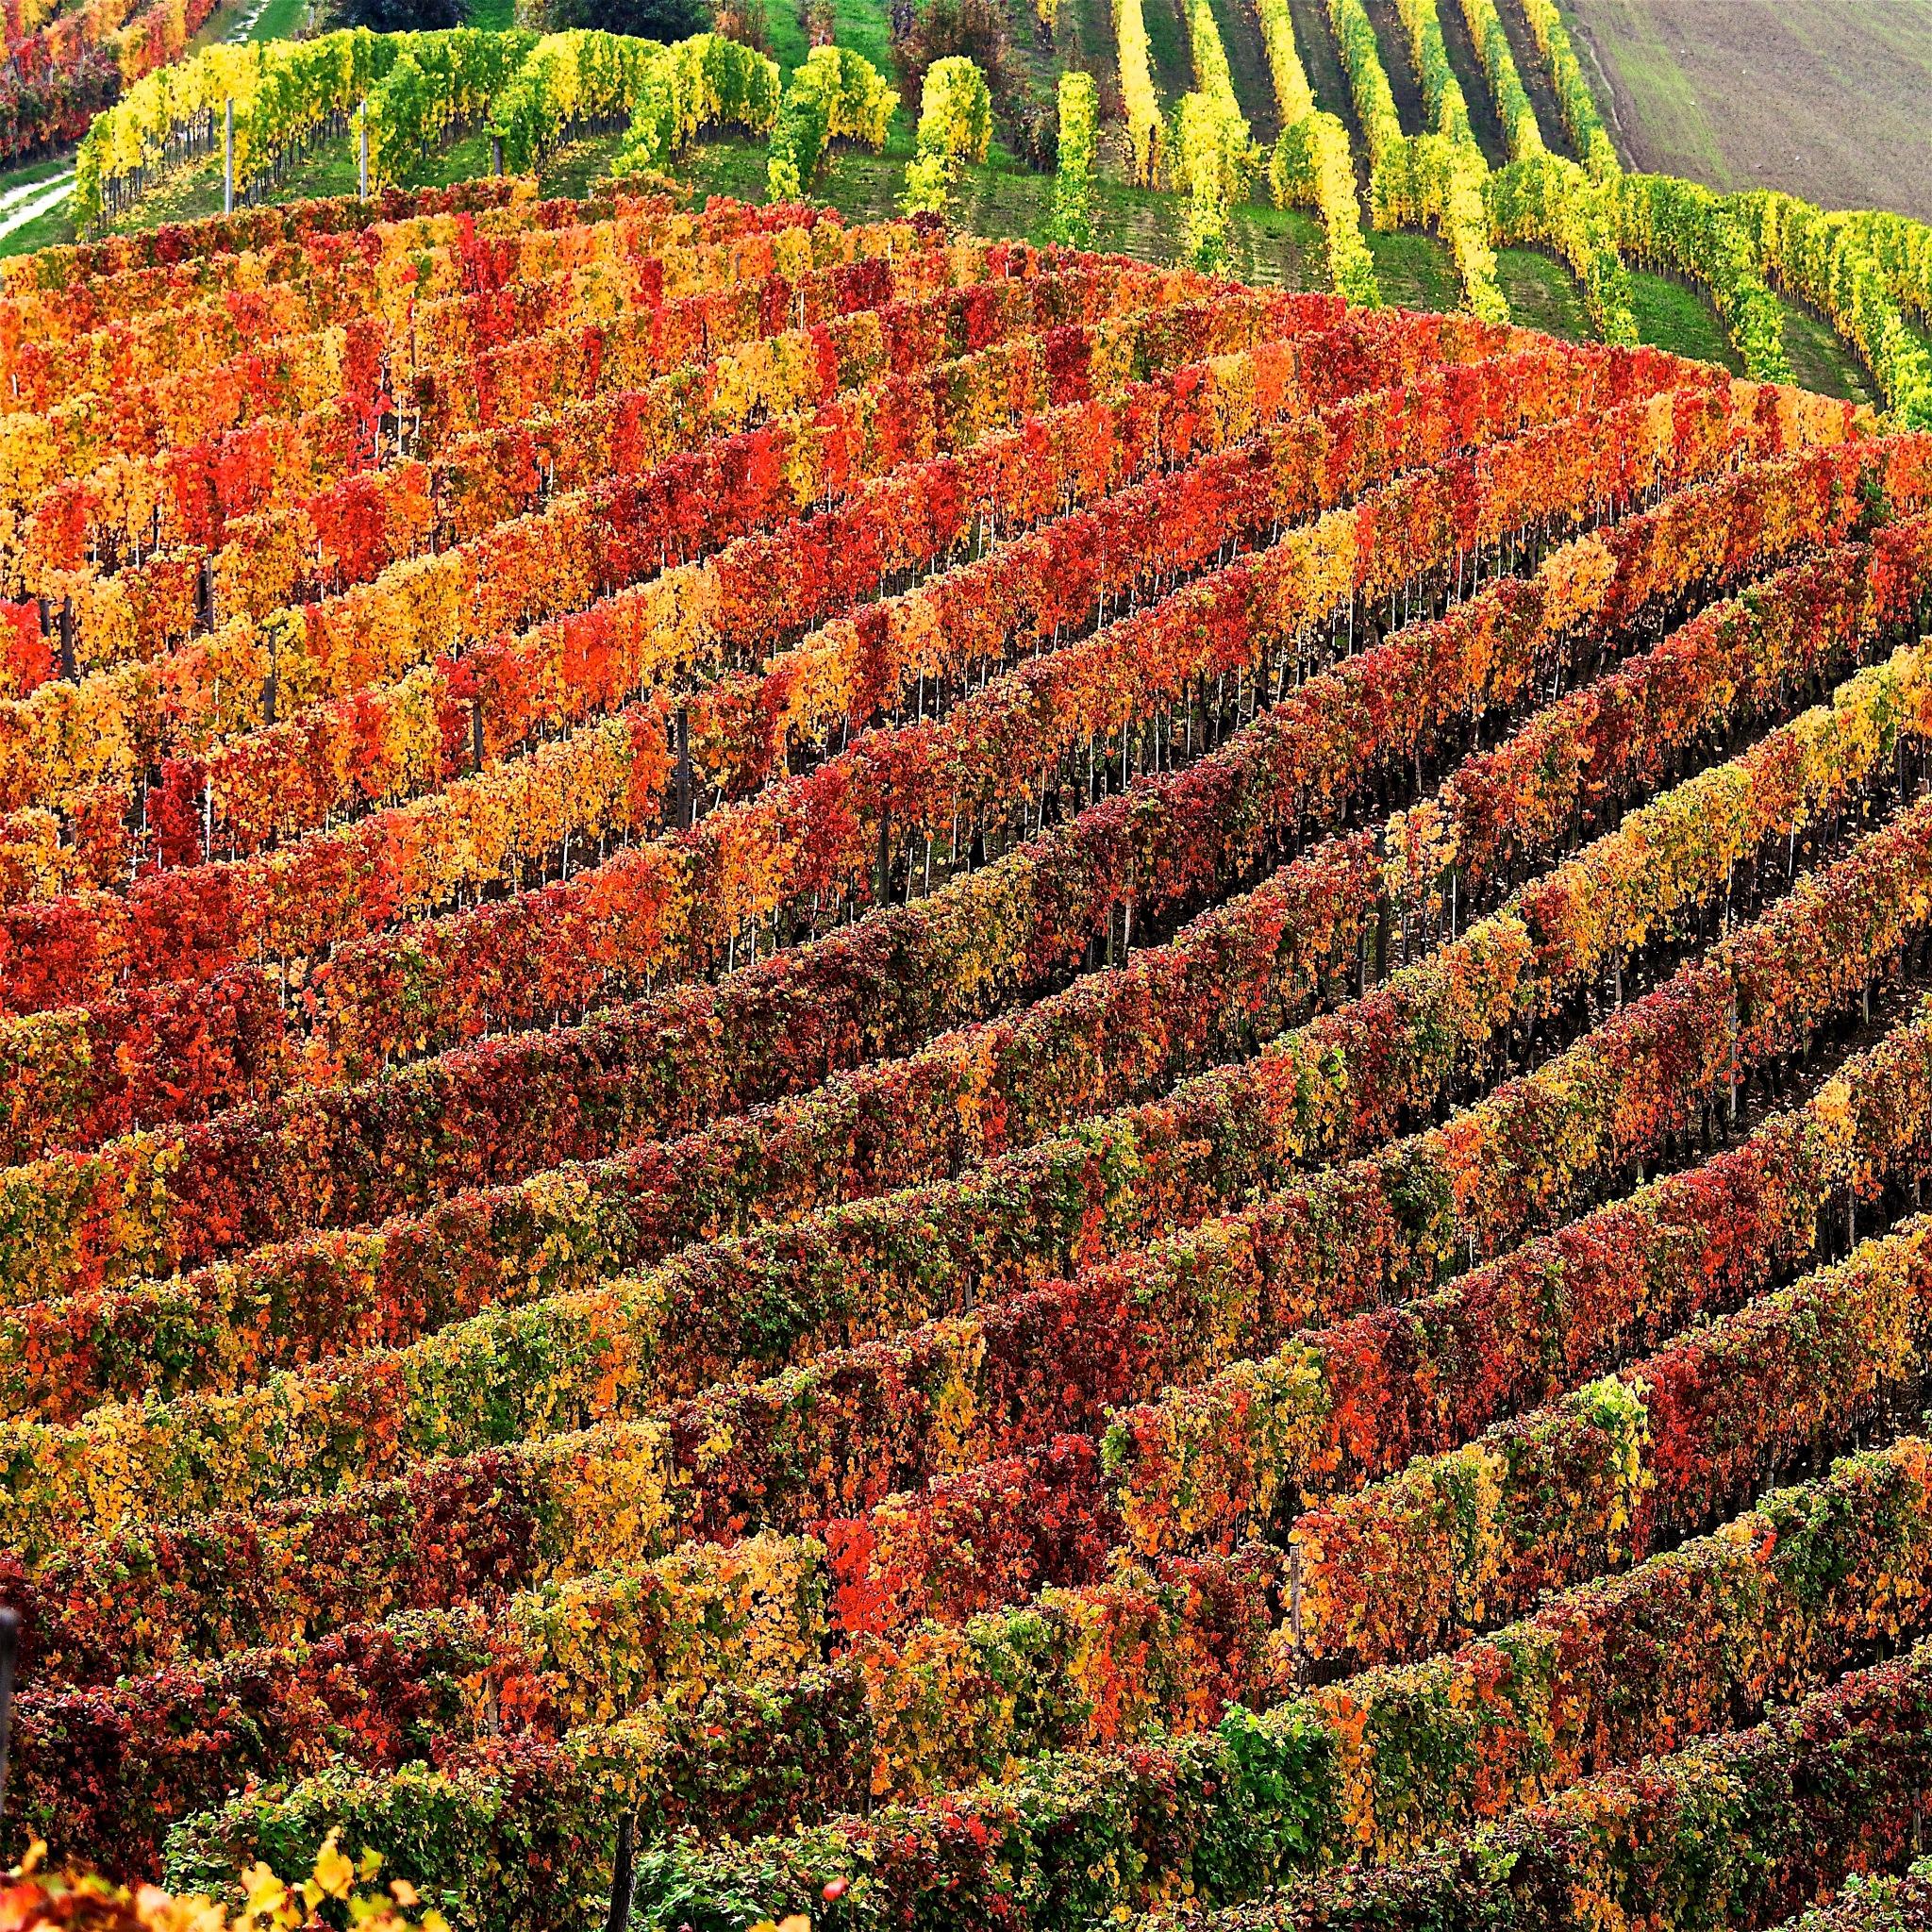 Walking through the vineyards - part one by Giovanni Battagliola